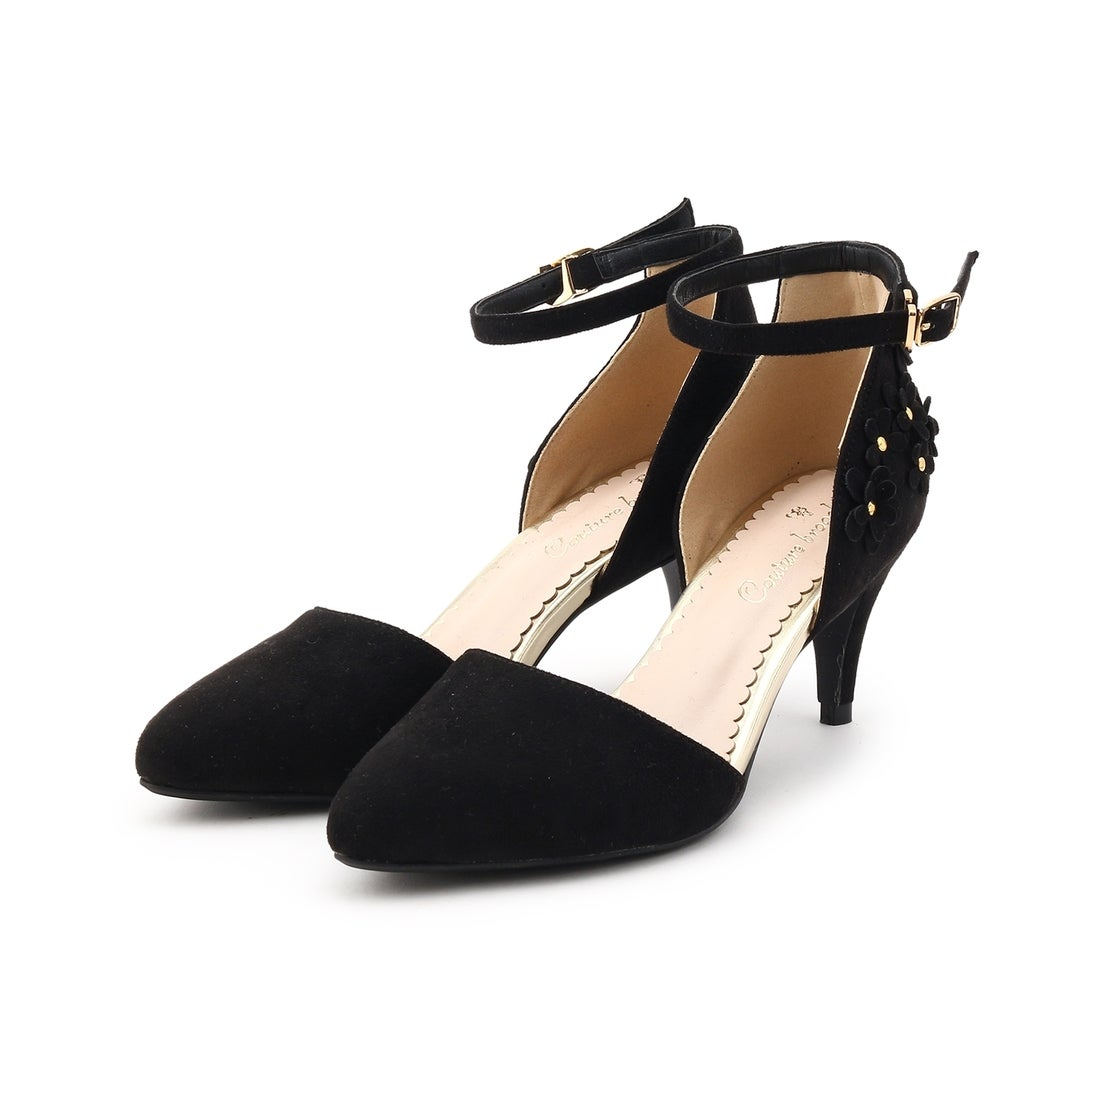 993a5272a94348 クチュール ブローチ Couture brooch フラワーセパレートパンプス (ブラック) -靴&ファッション通販 ロコンド〜自宅で試着、気軽に返品